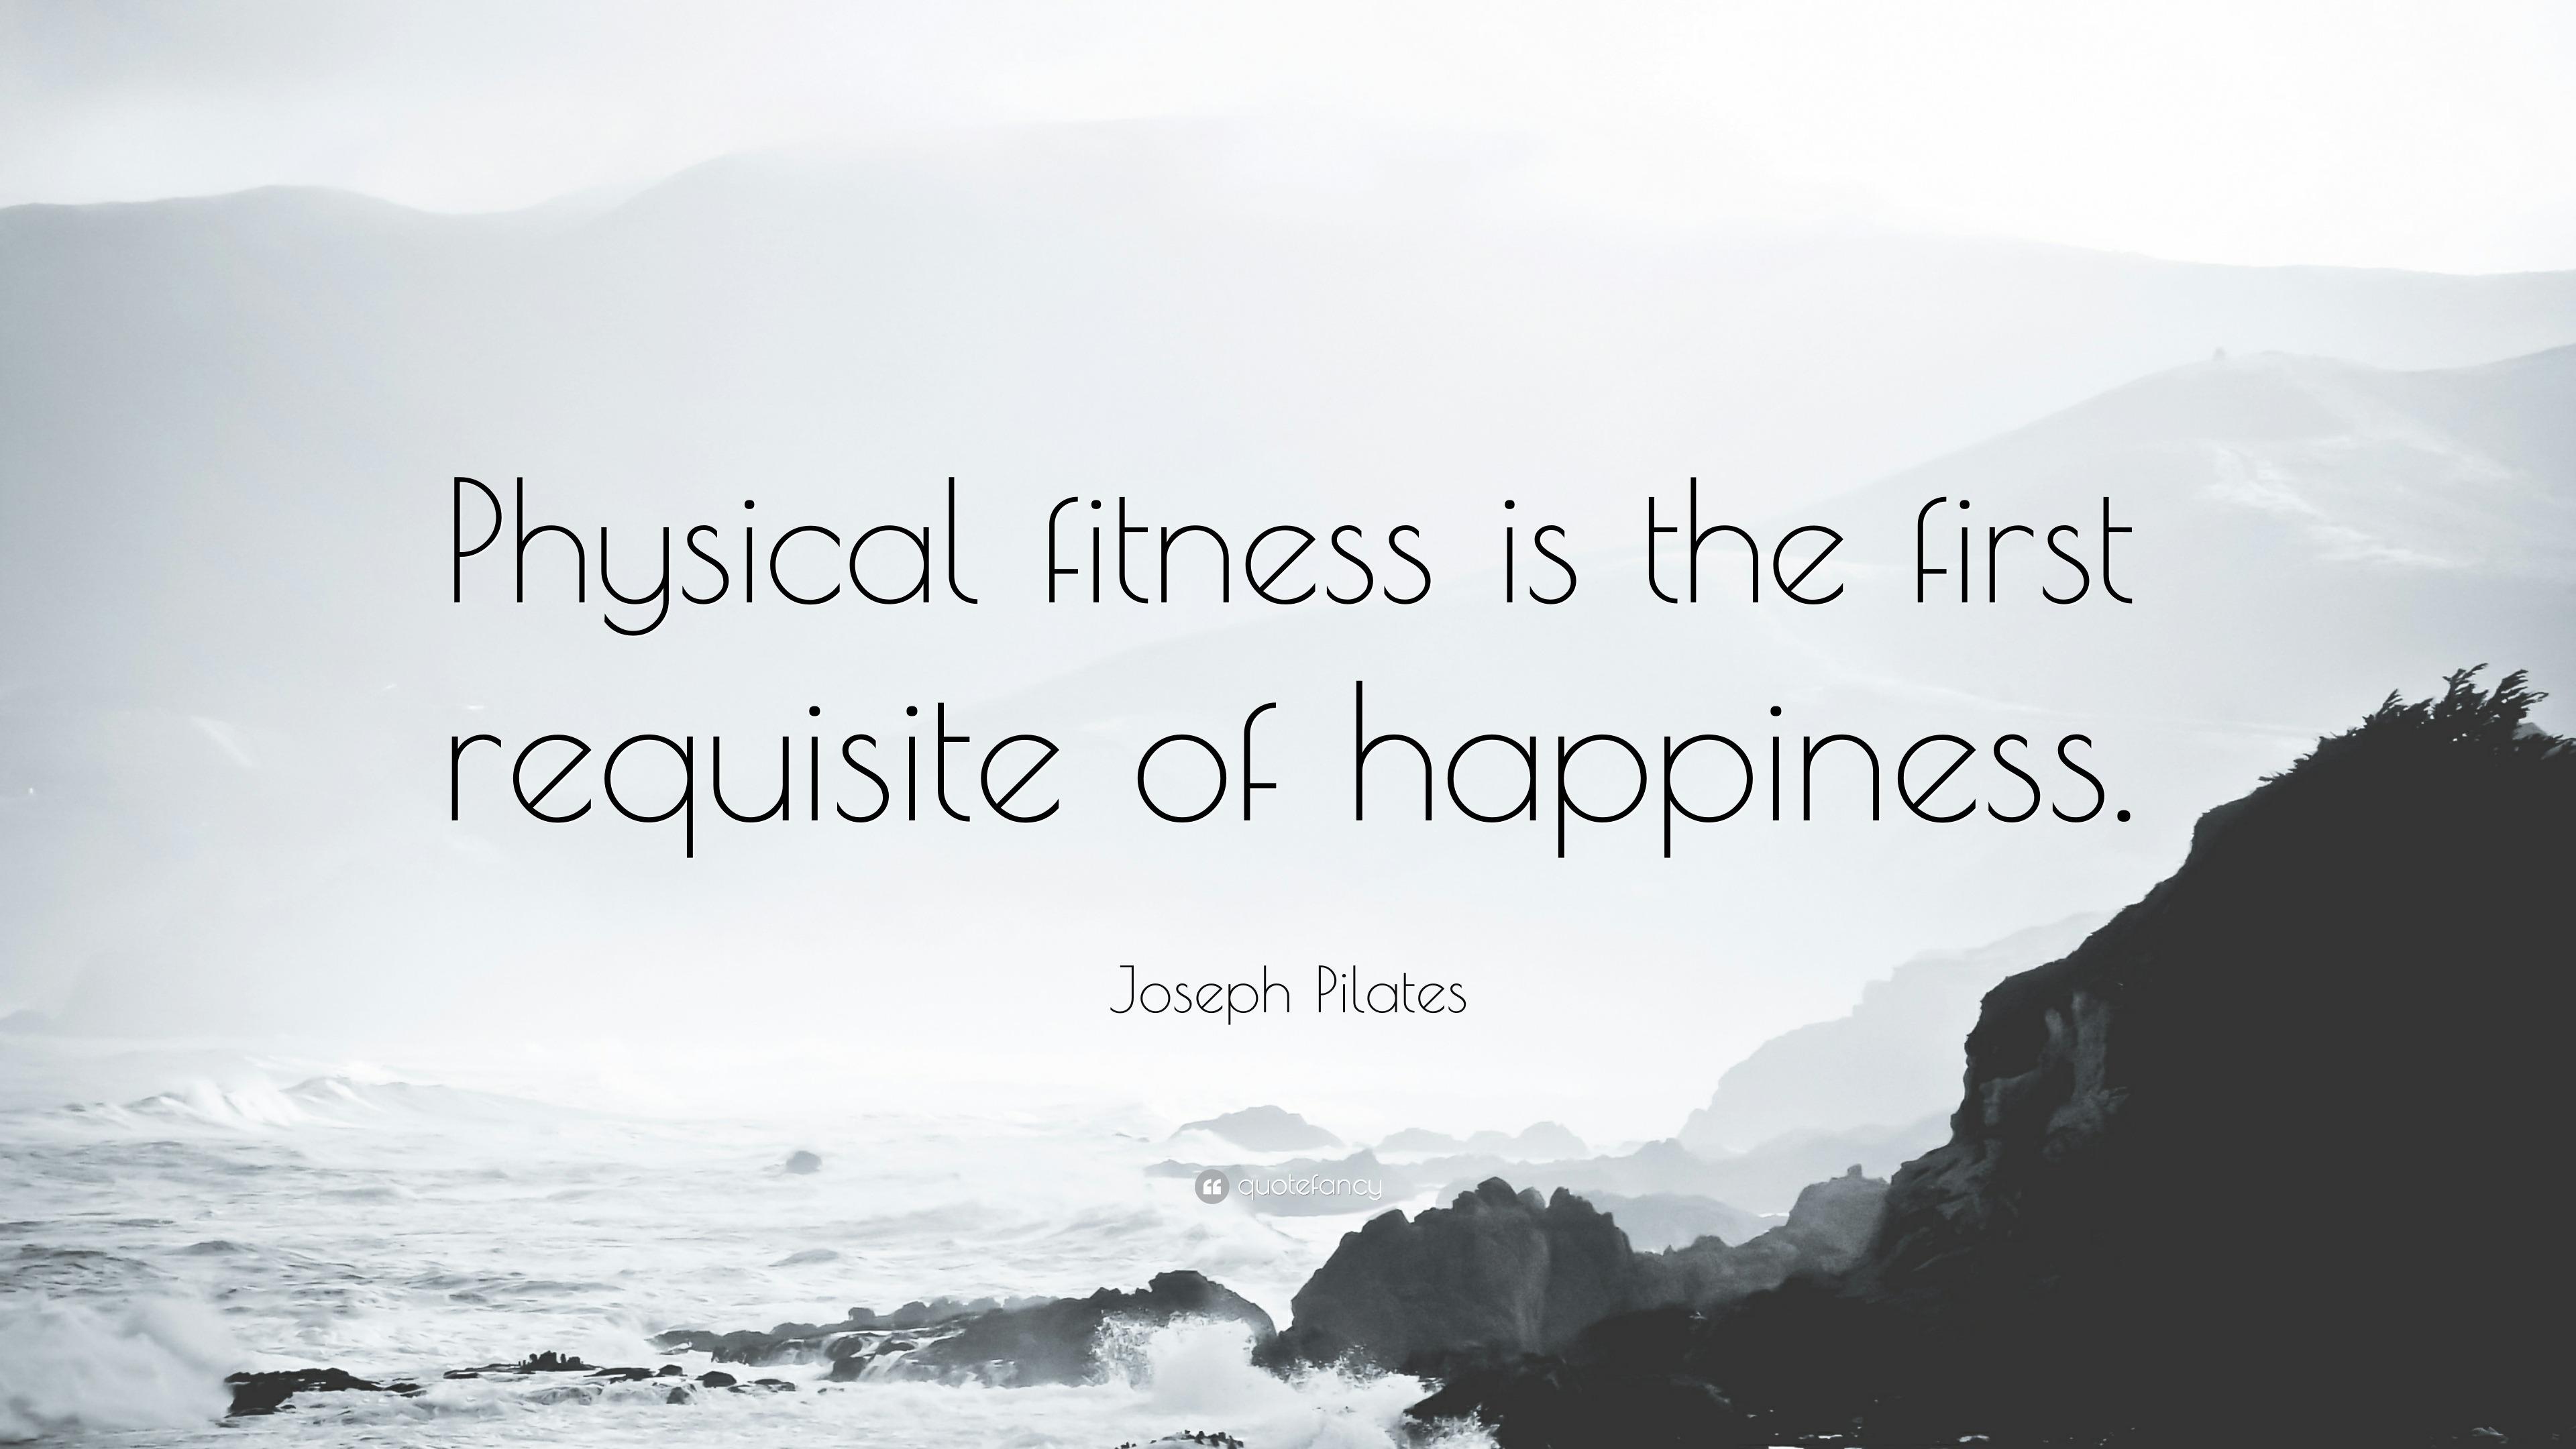 Pilates Quotes Joseph Pilates Quotes (54 wallpapers)   Quotefancy Pilates Quotes